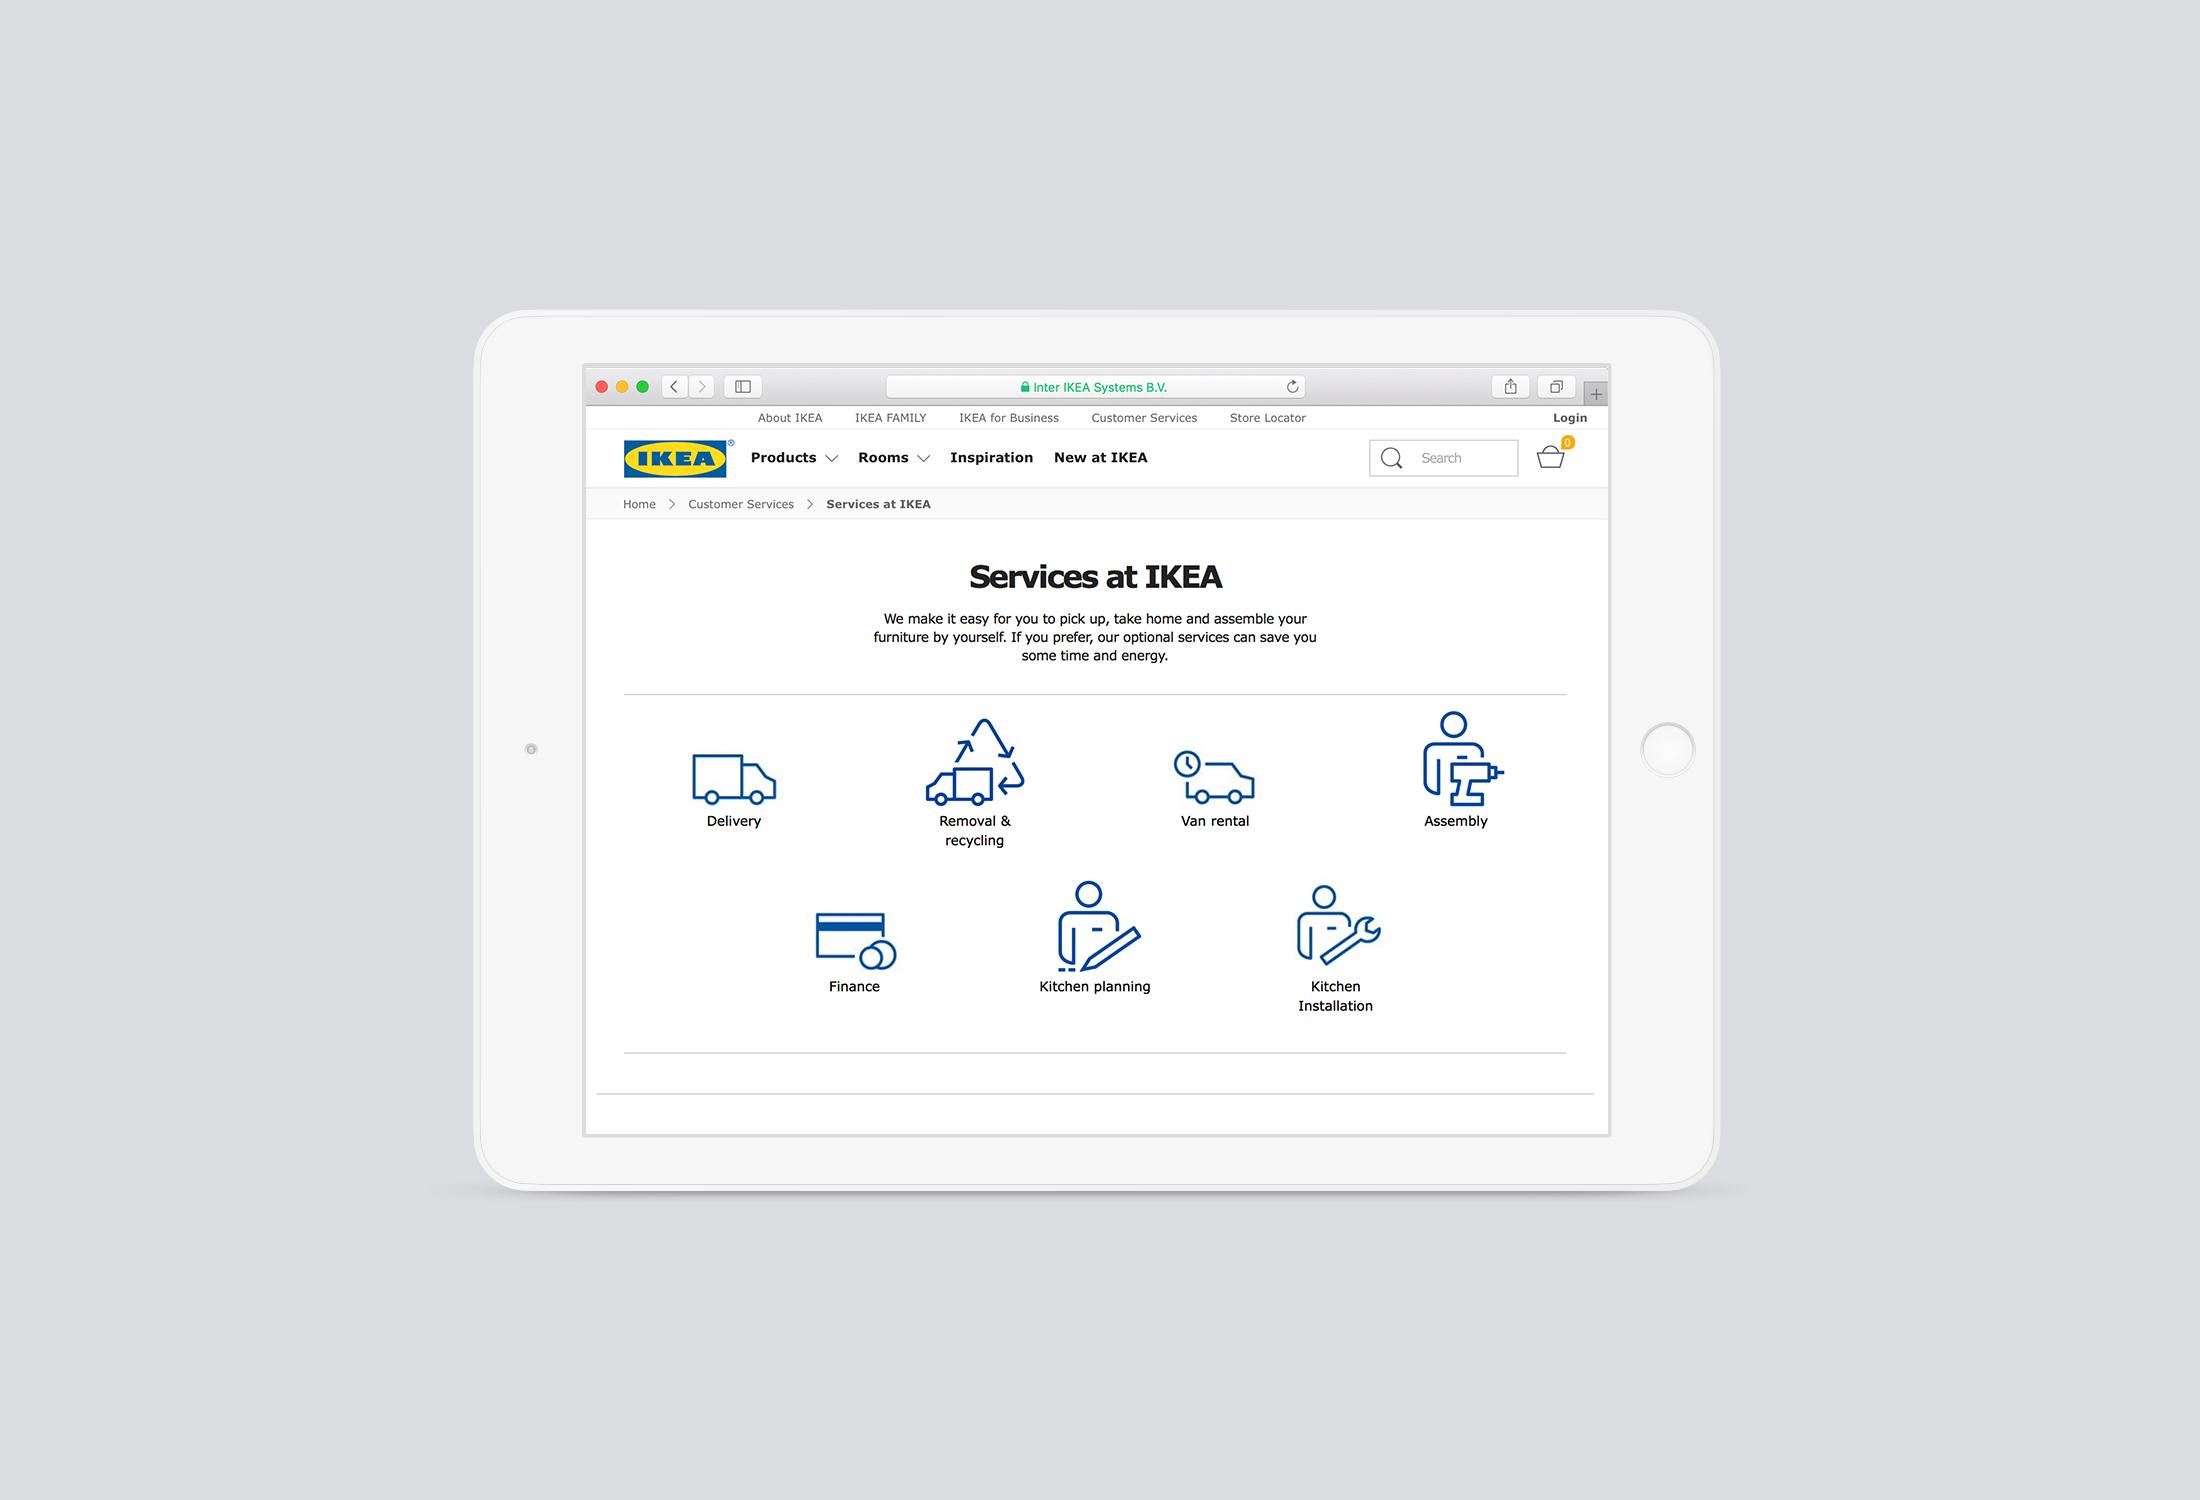 _IKEA_services online.jpg